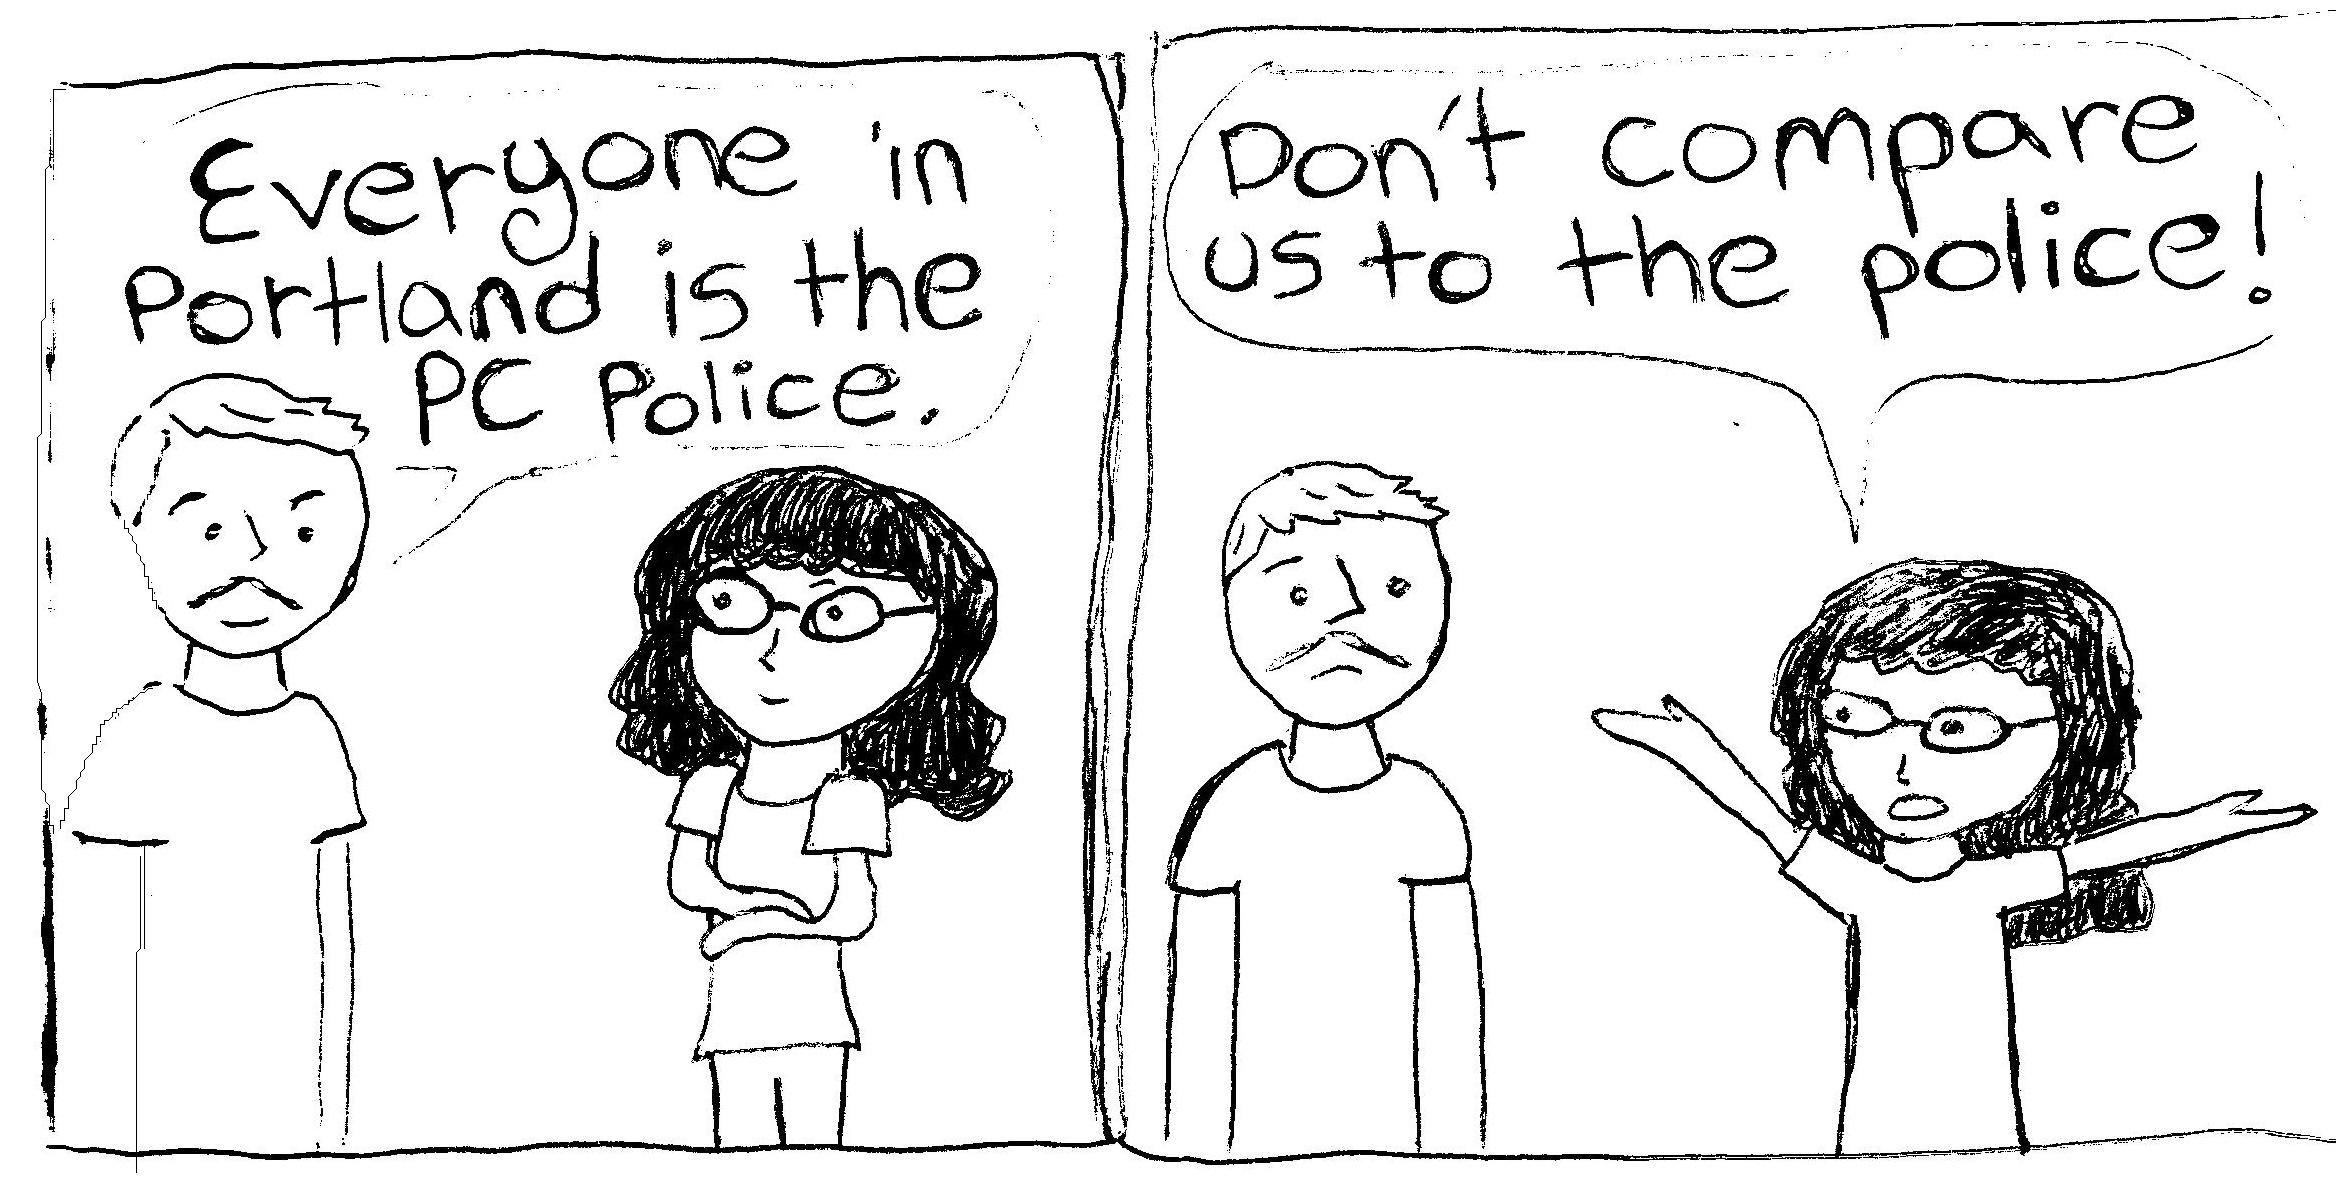 PC Police